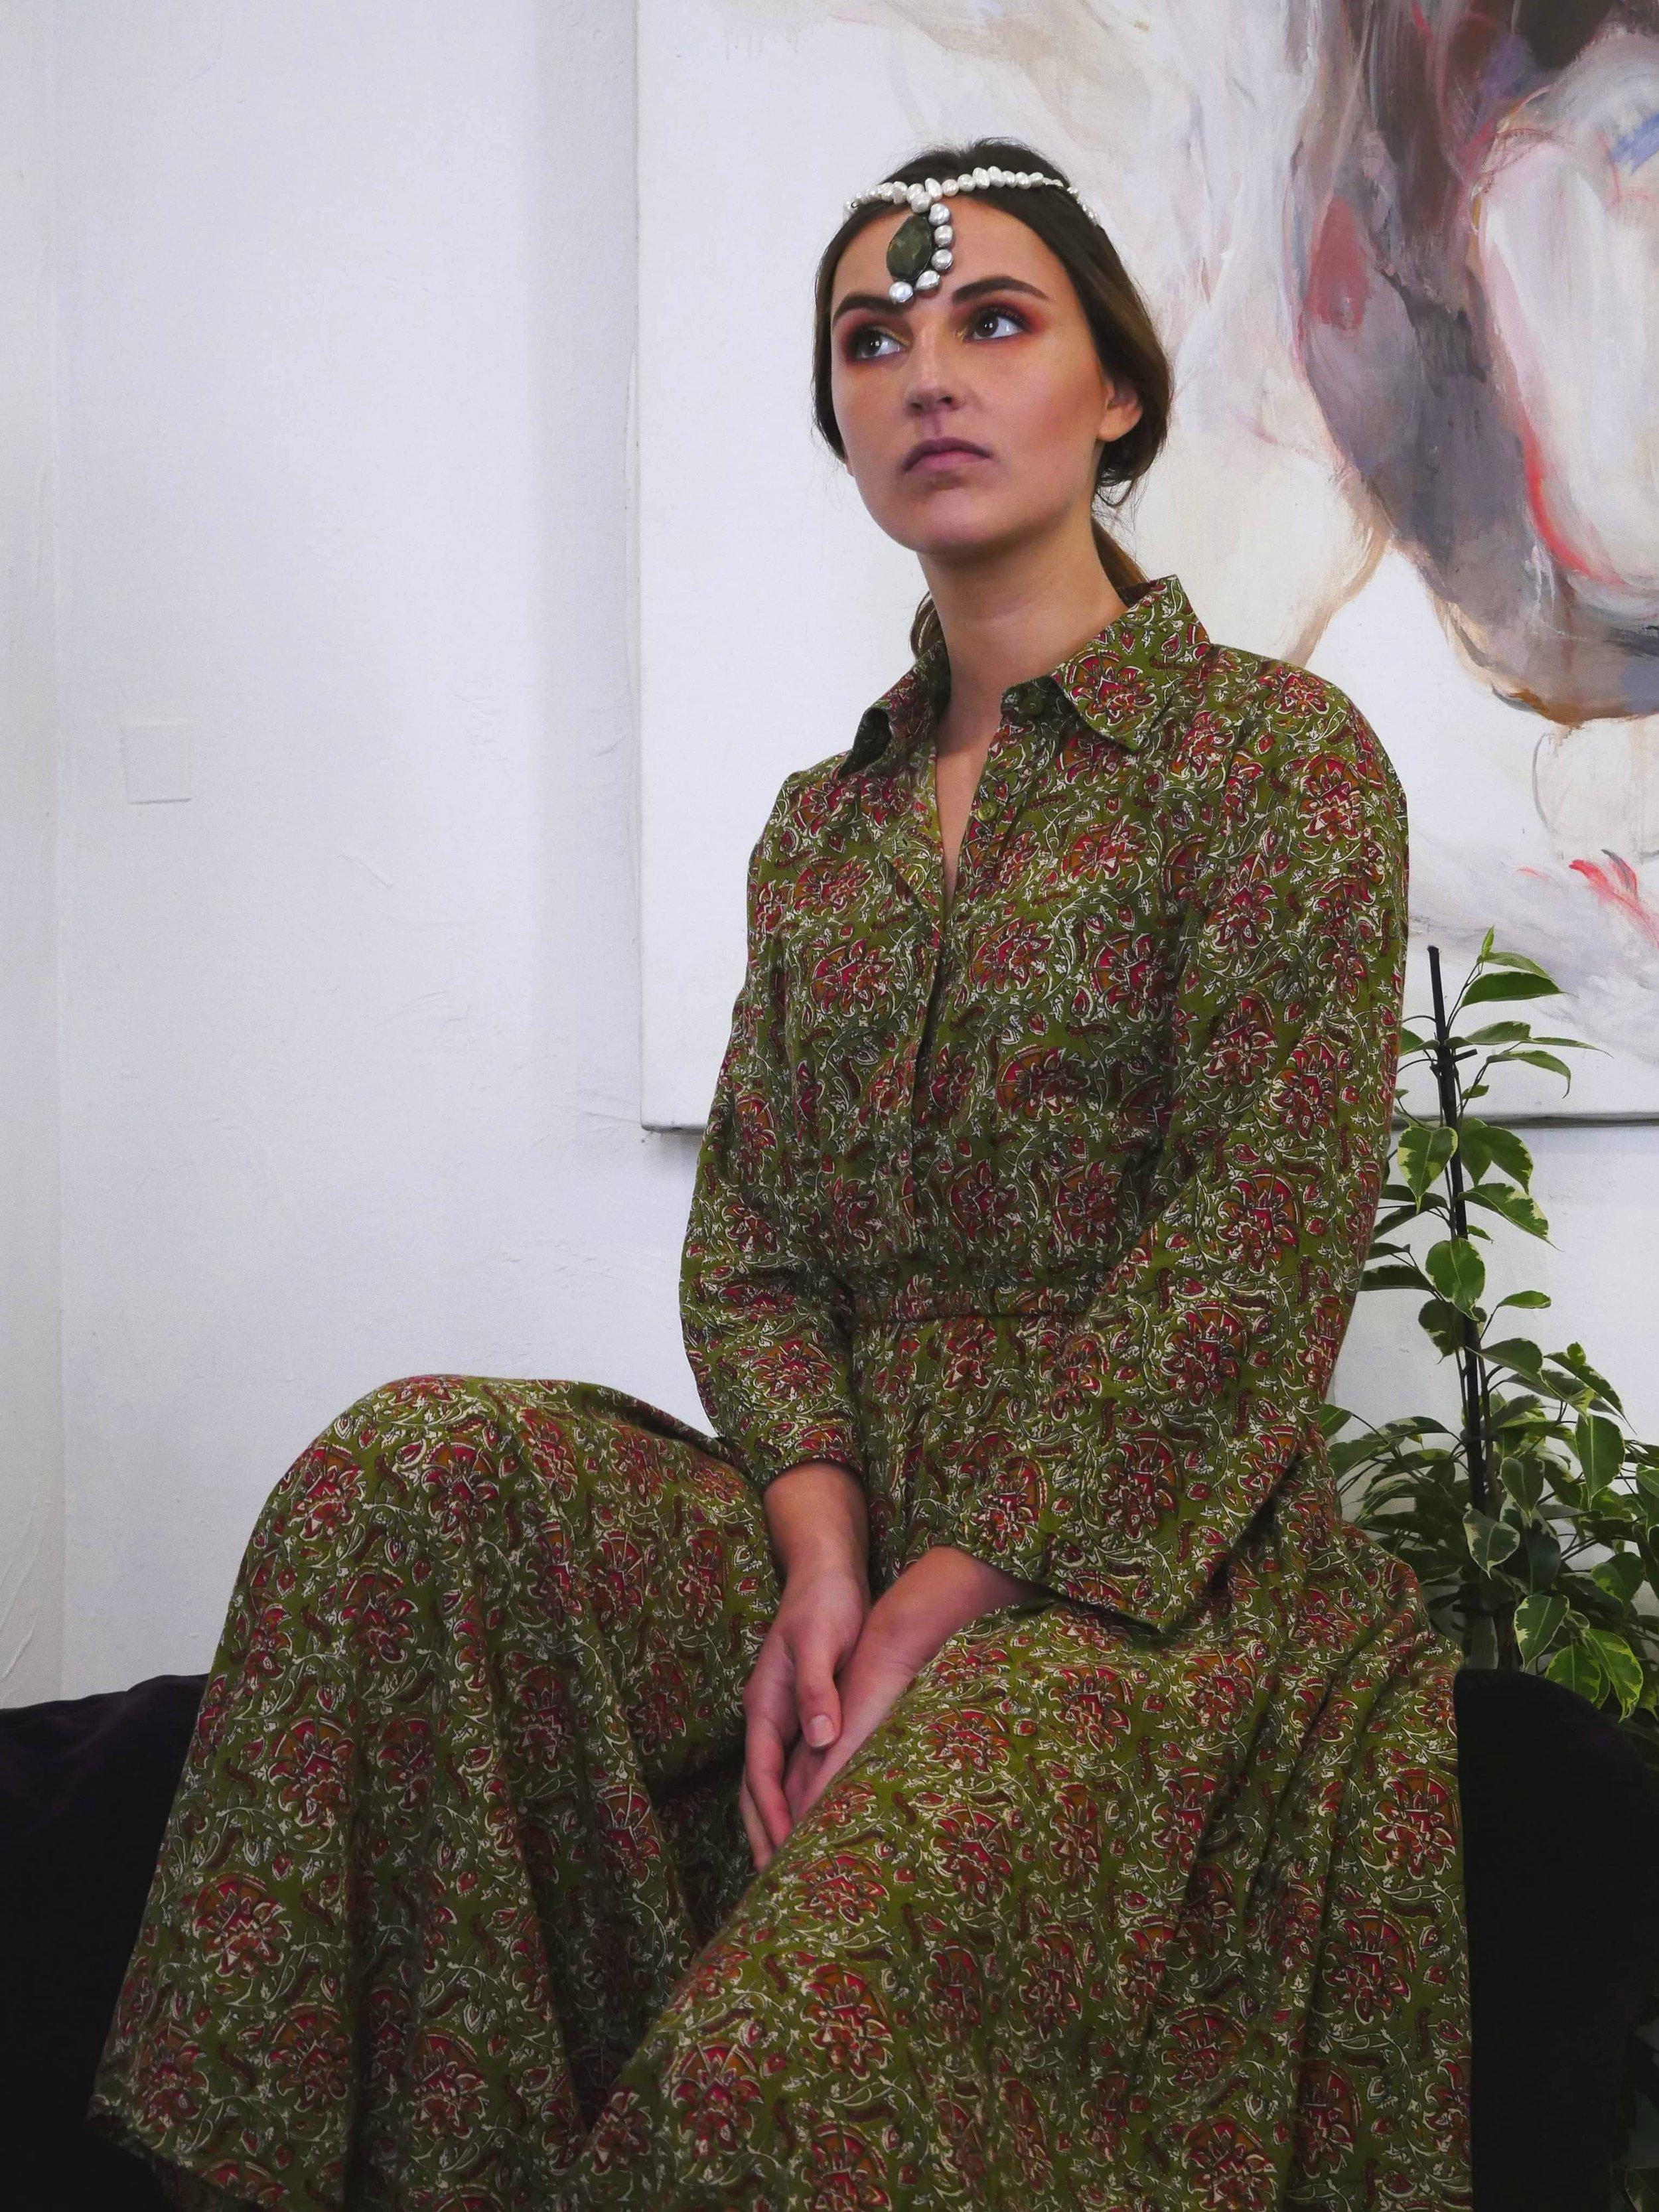 ANA_KAKILONDRESS_CHARZA19